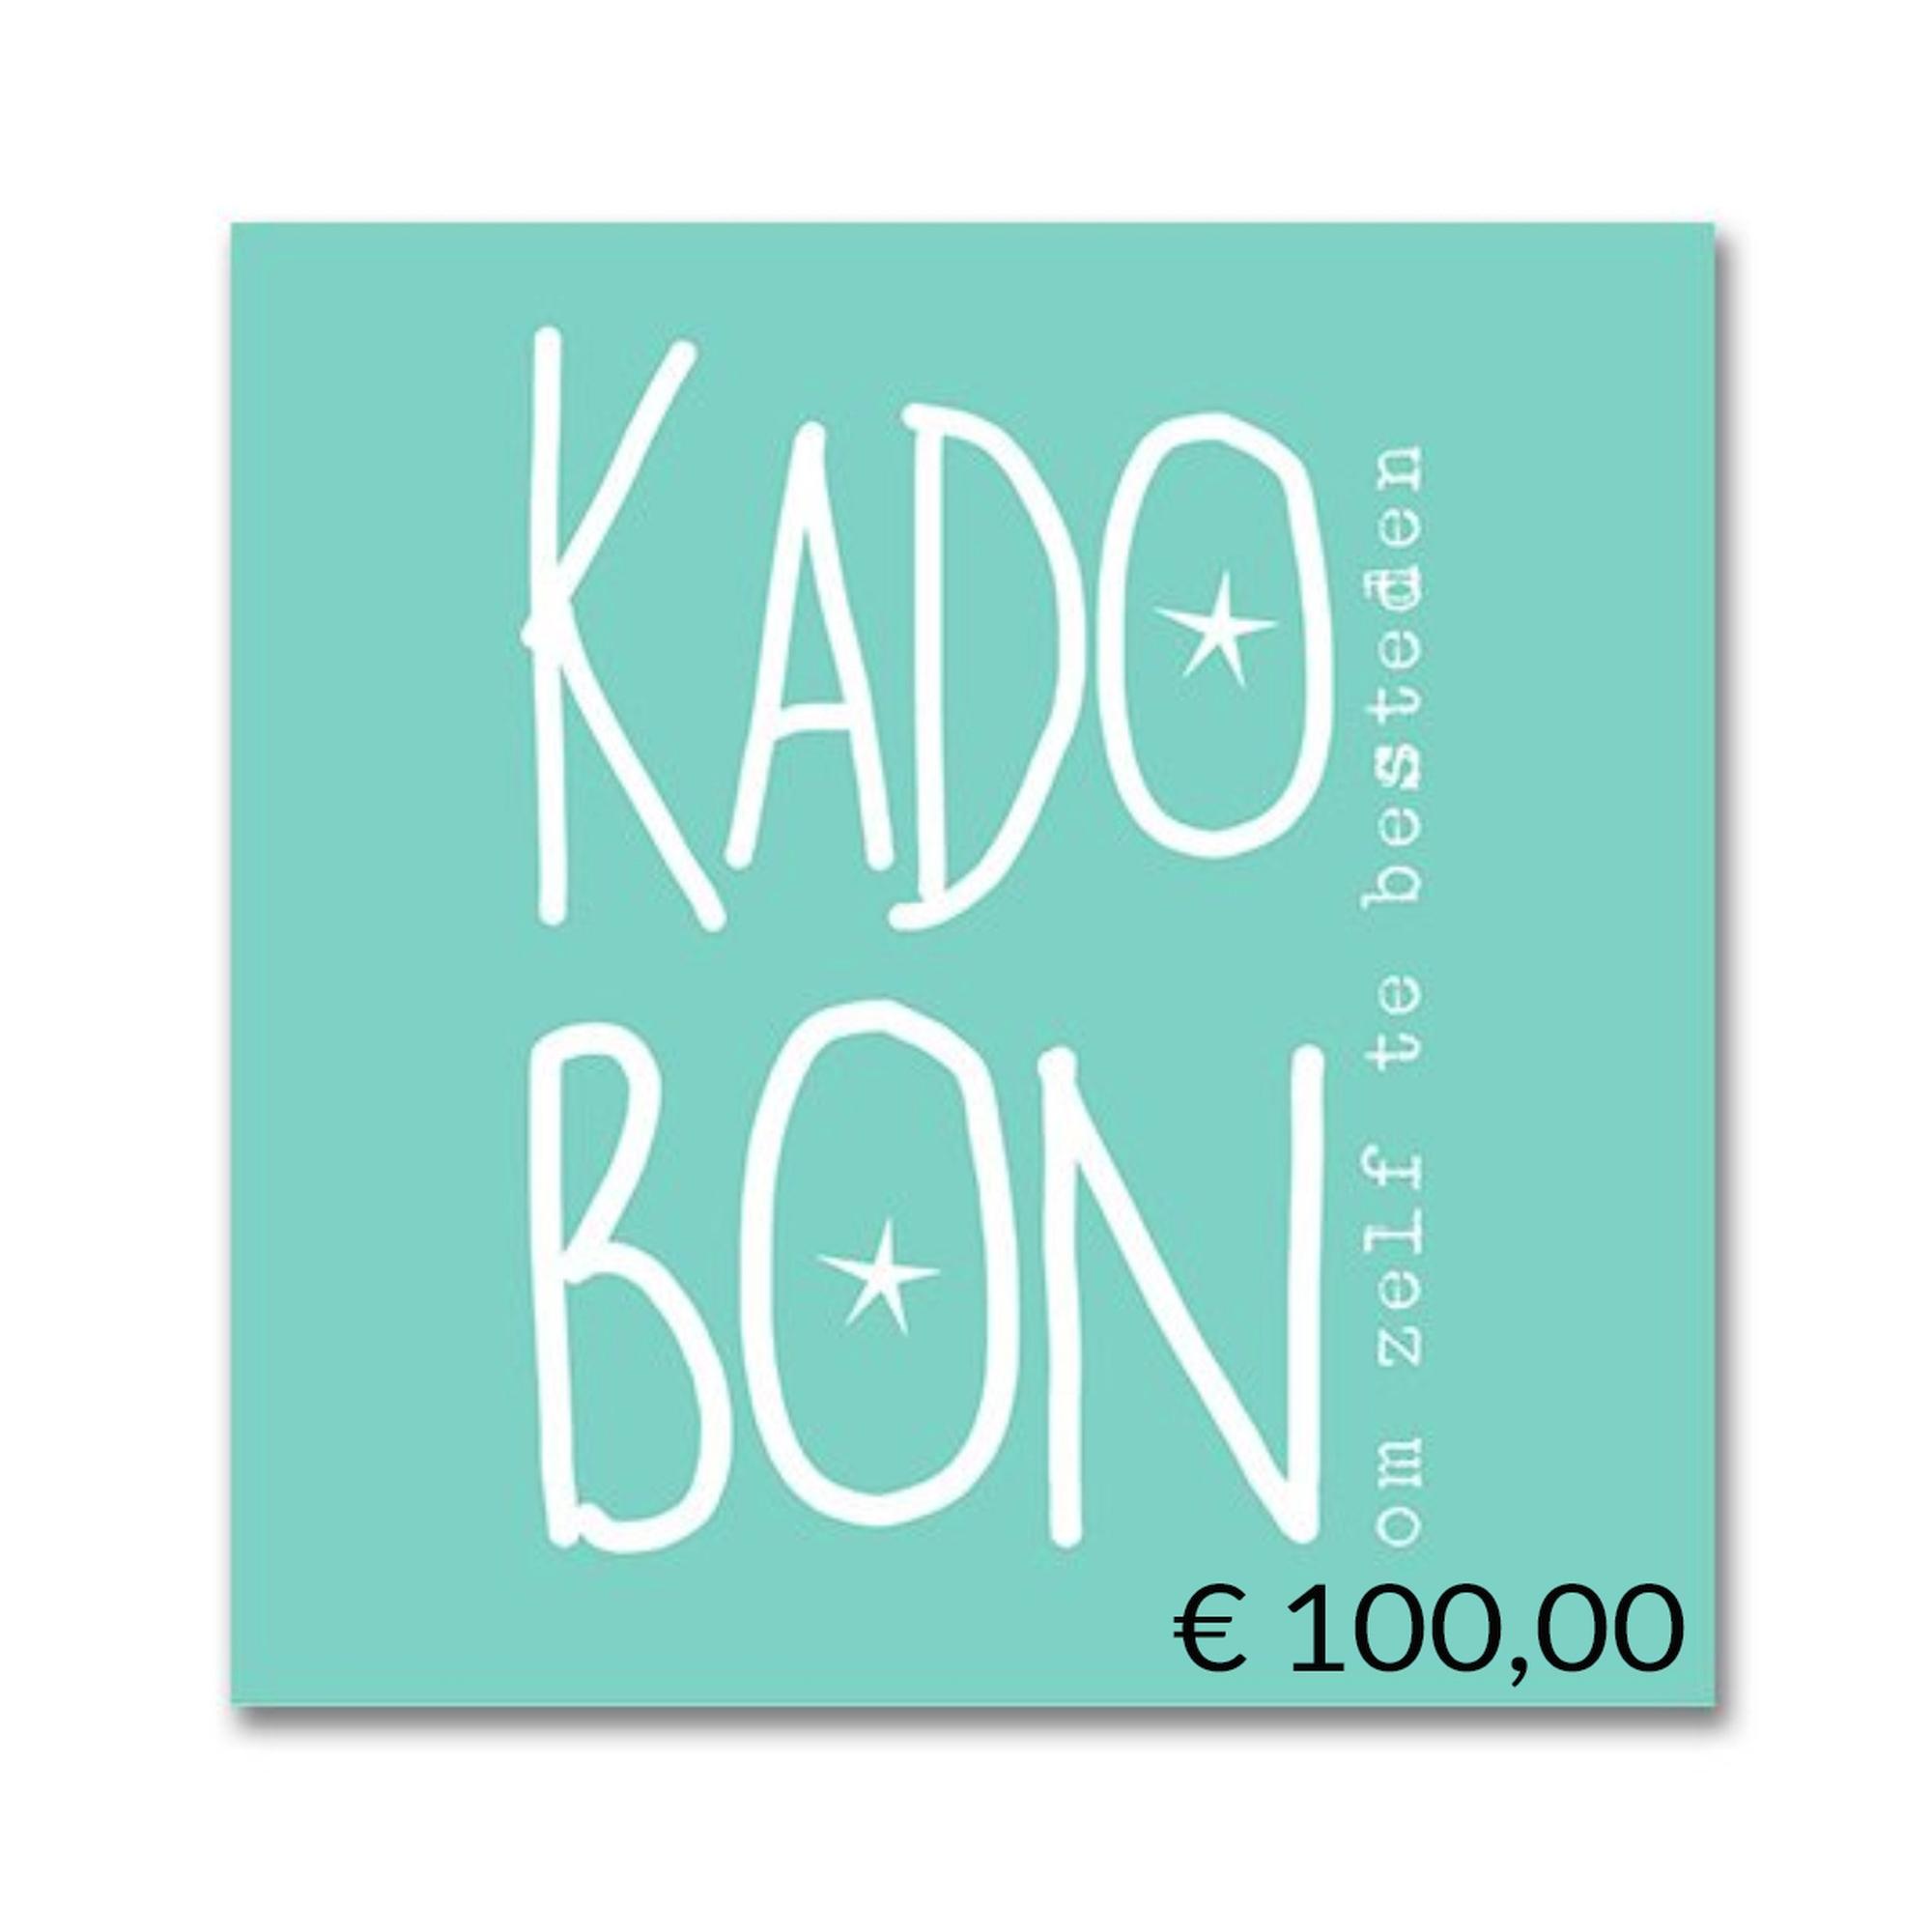 Steenwijk Schoenmode Kadobon Eur 100,00